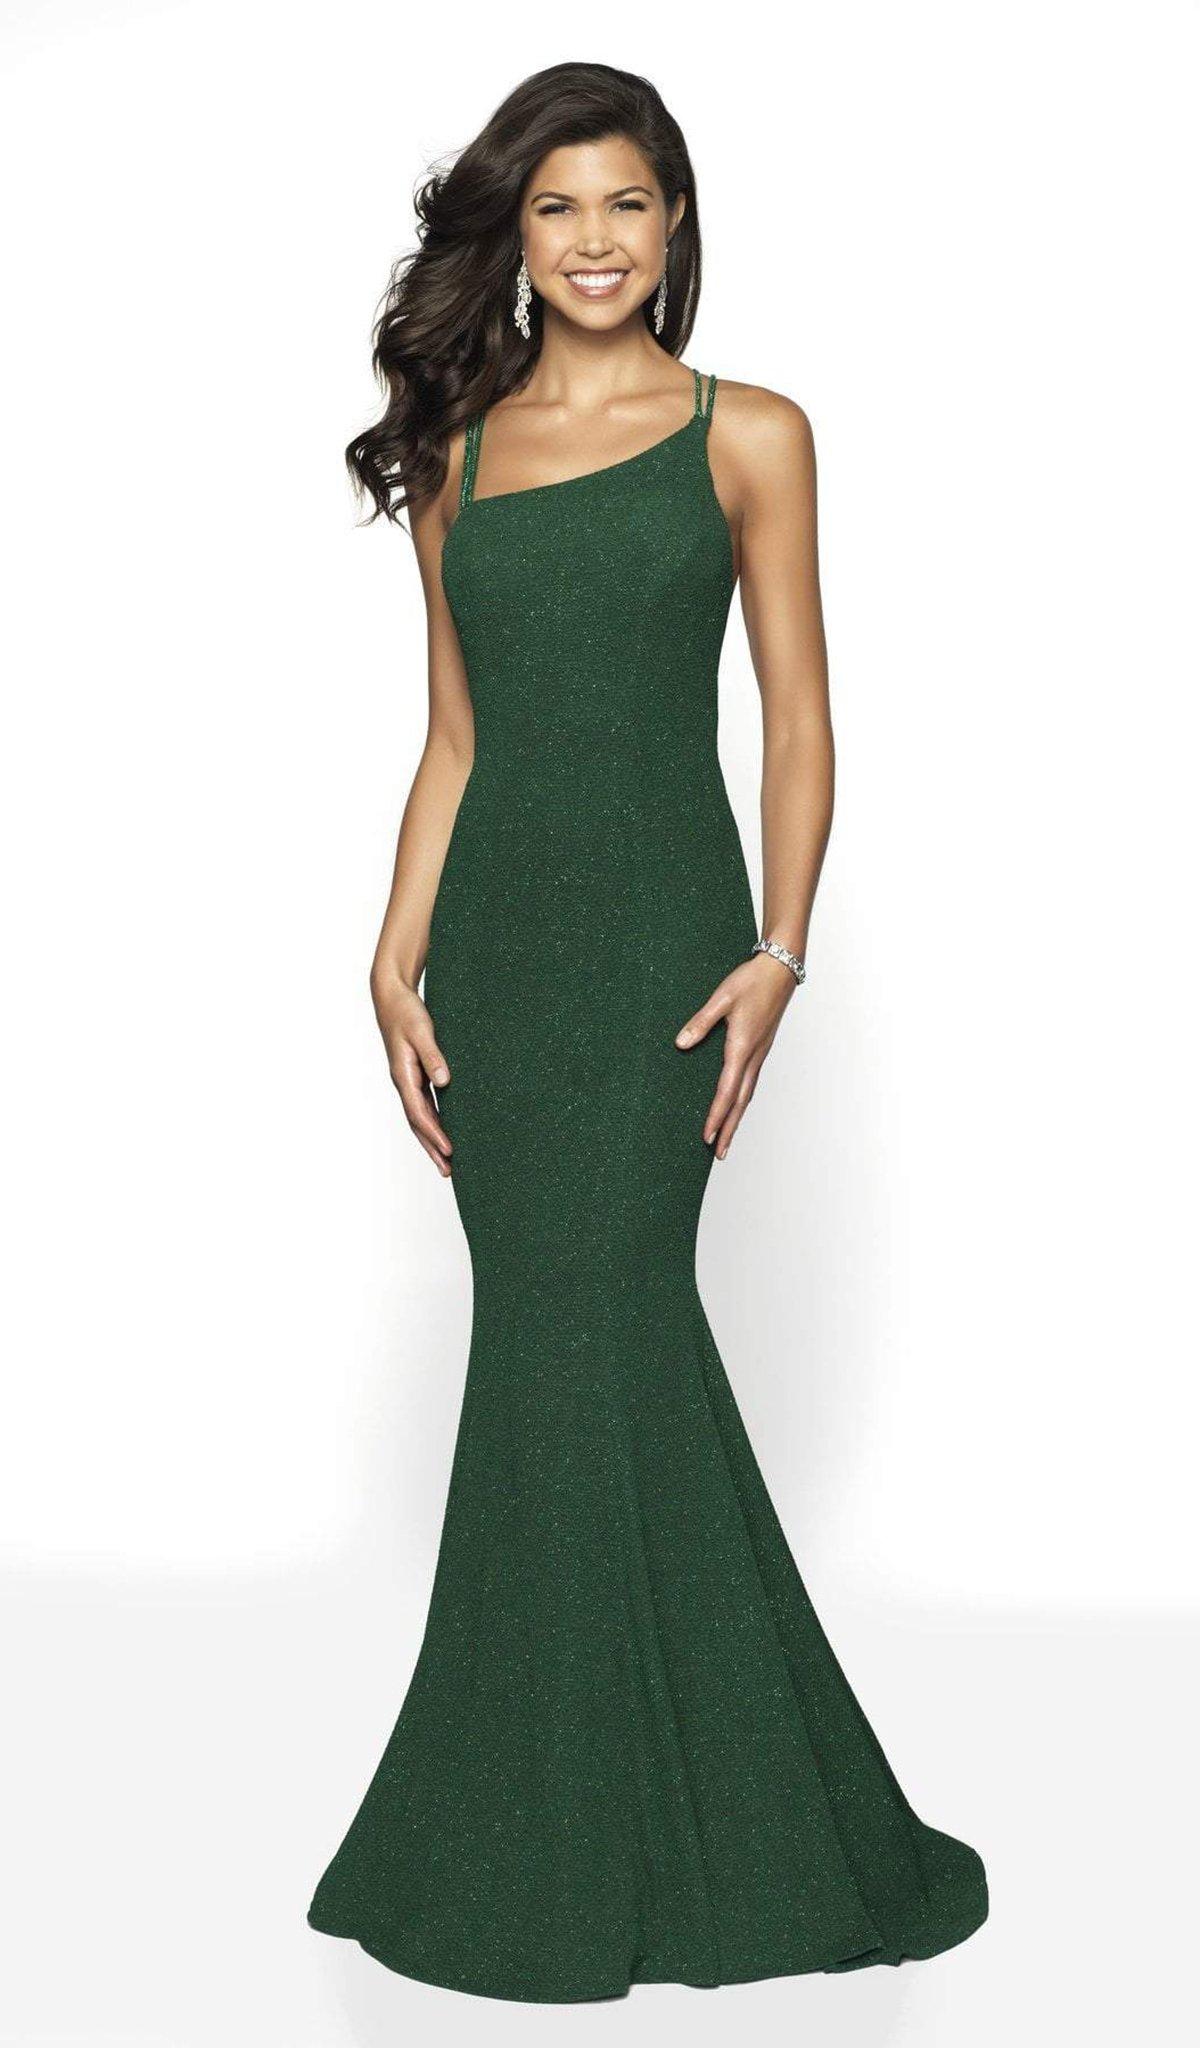 Blush by Alexia Designs - 11786 Asymmetric Glitter Knit Mermaid Dress